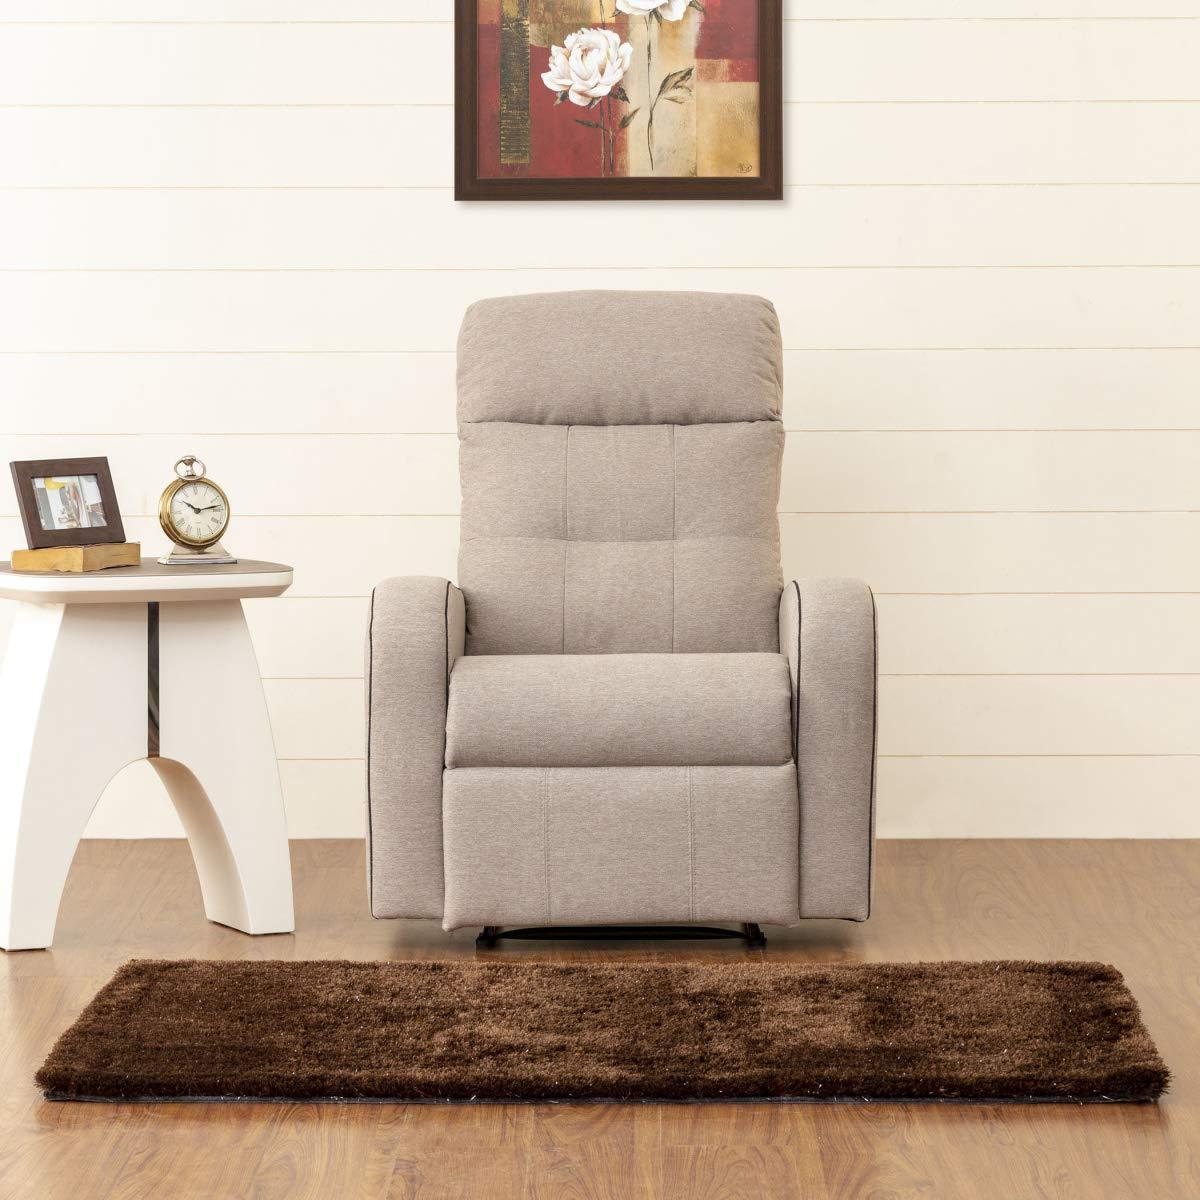 5.Home Centre Toledo Single Recliner Sofa